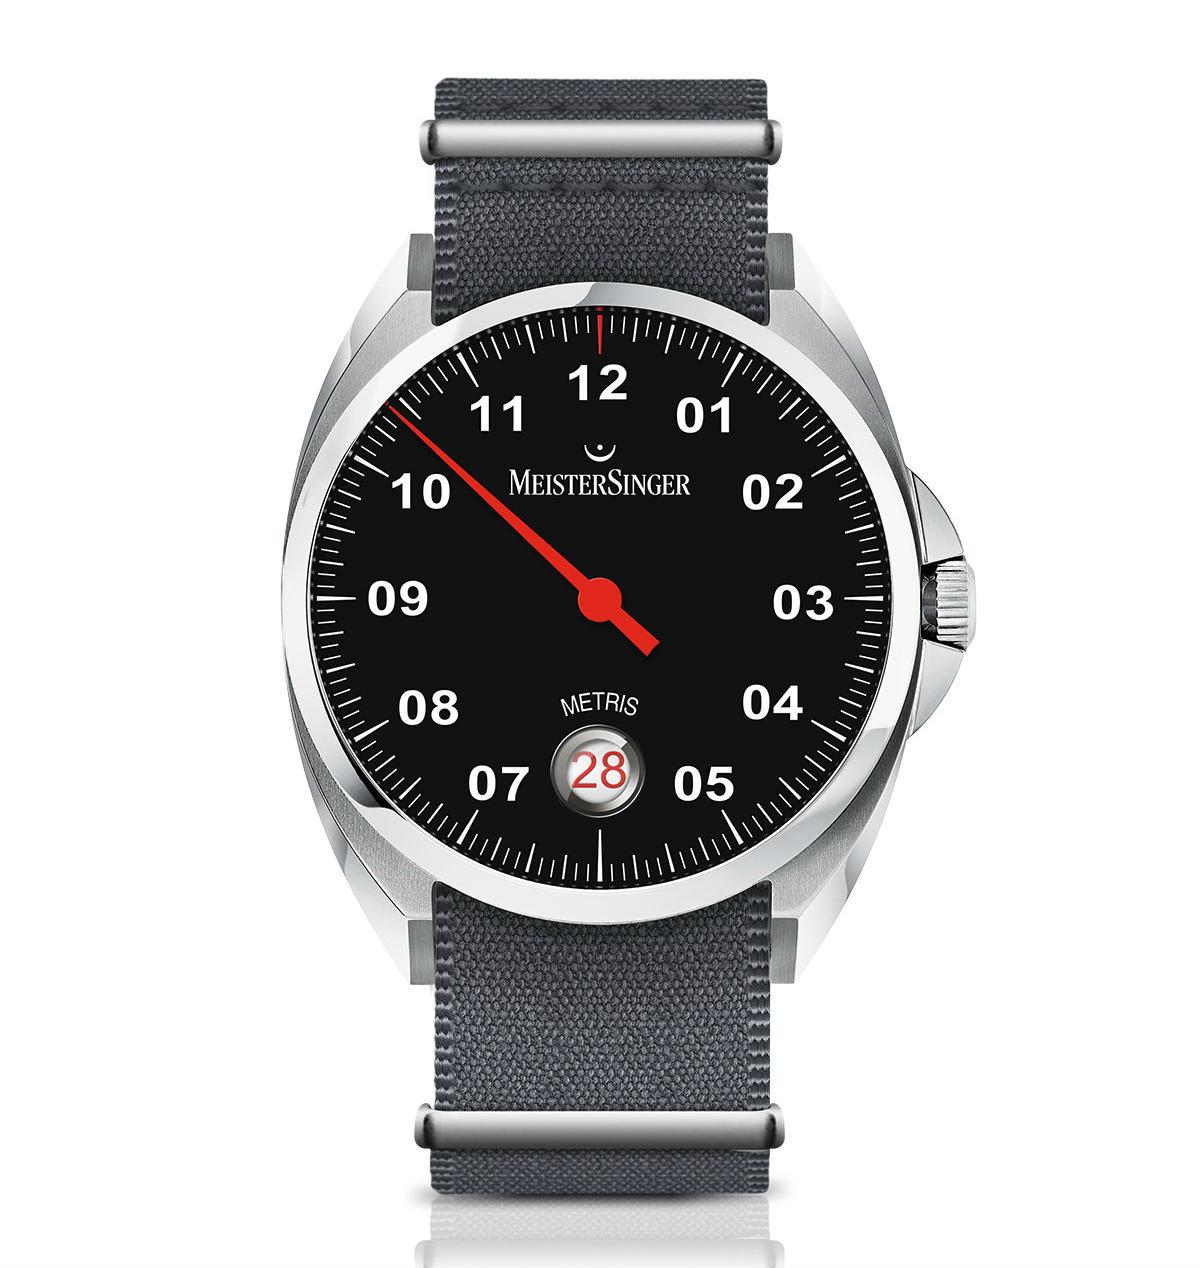 Meistersinger Metris watch